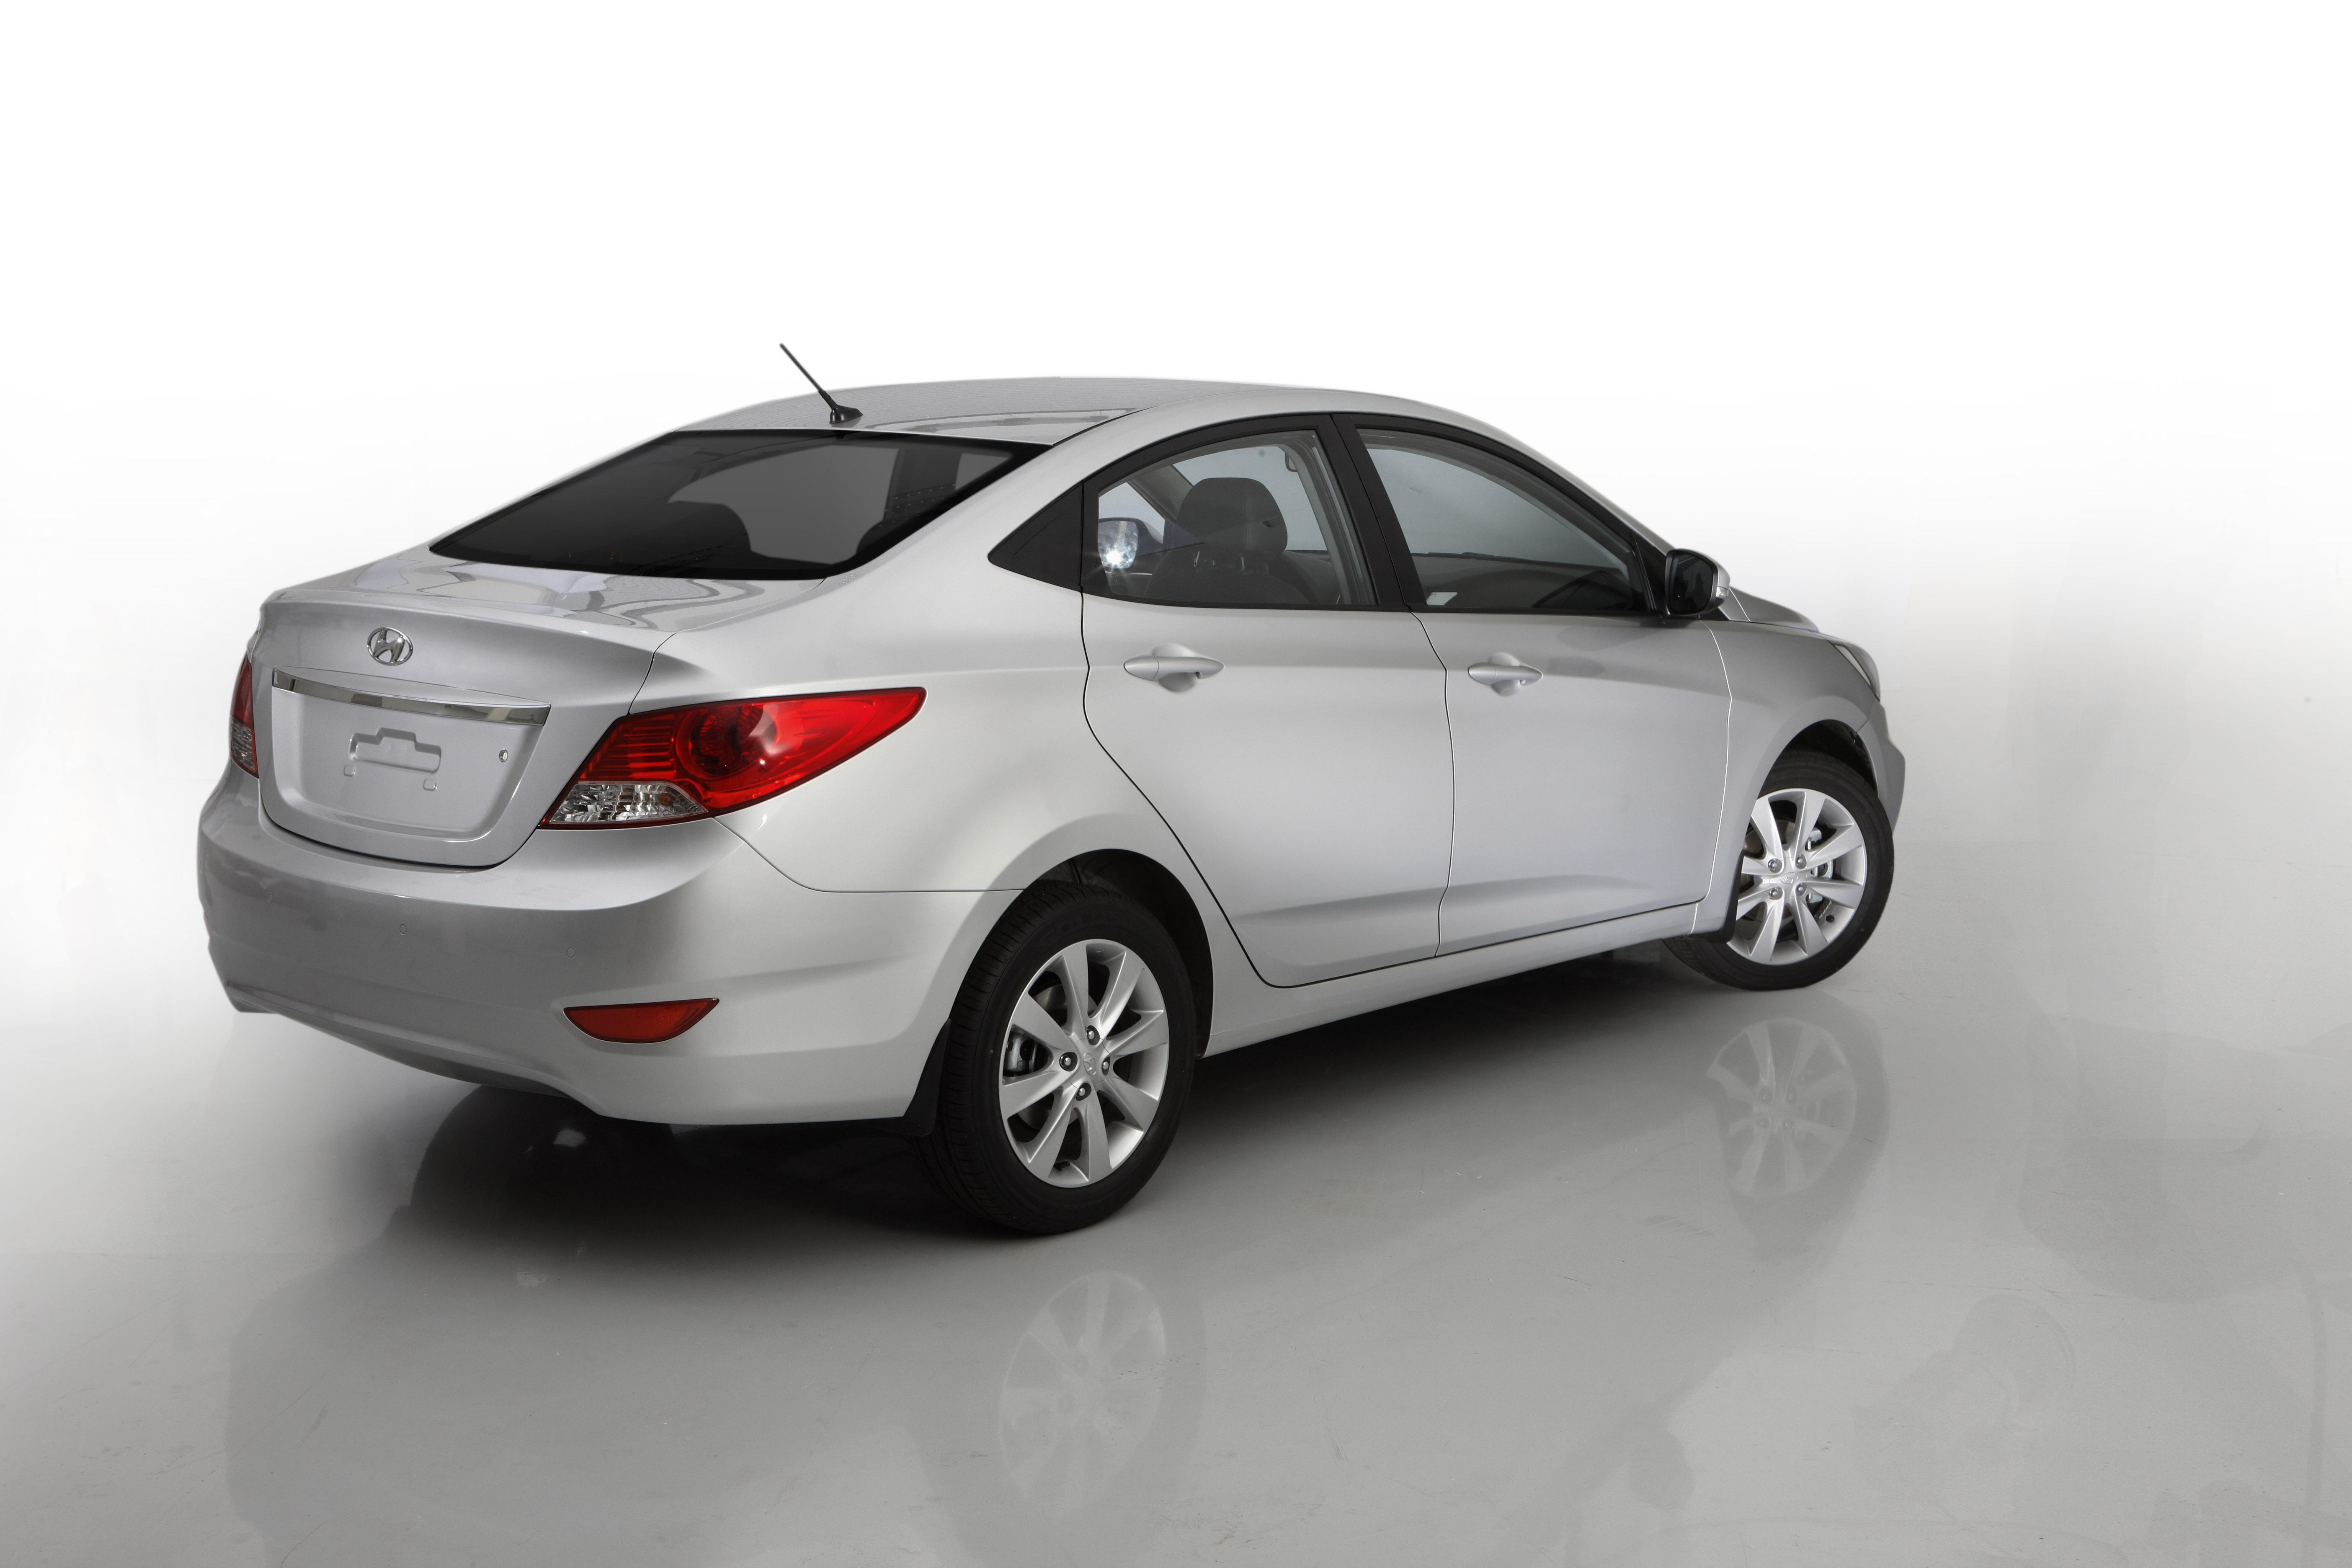 Contacts hyundai motor company 82 2 3464 2160 http www hyundai com